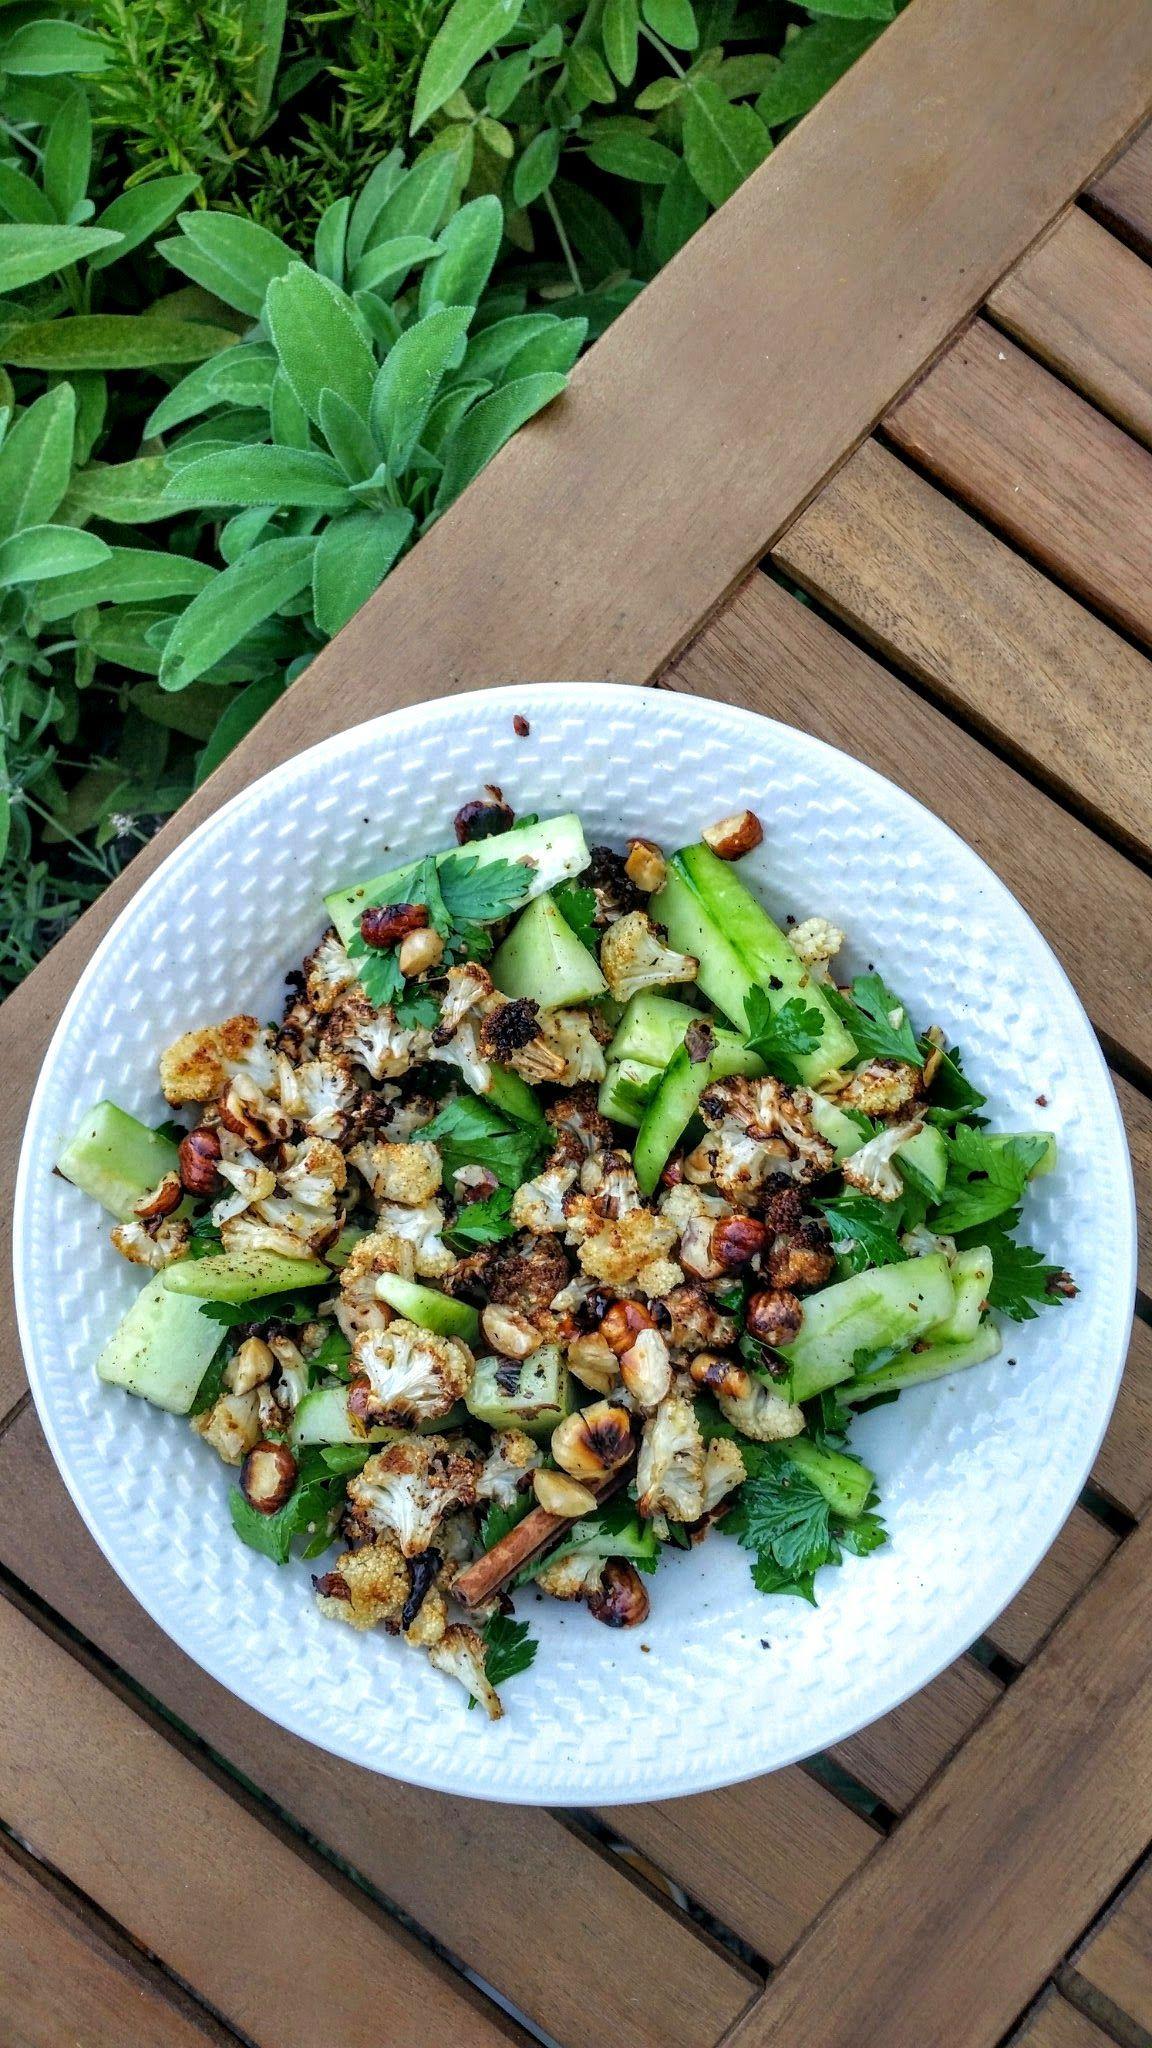 Roasted Cauliflower Salad from Yotam Ottolenghi